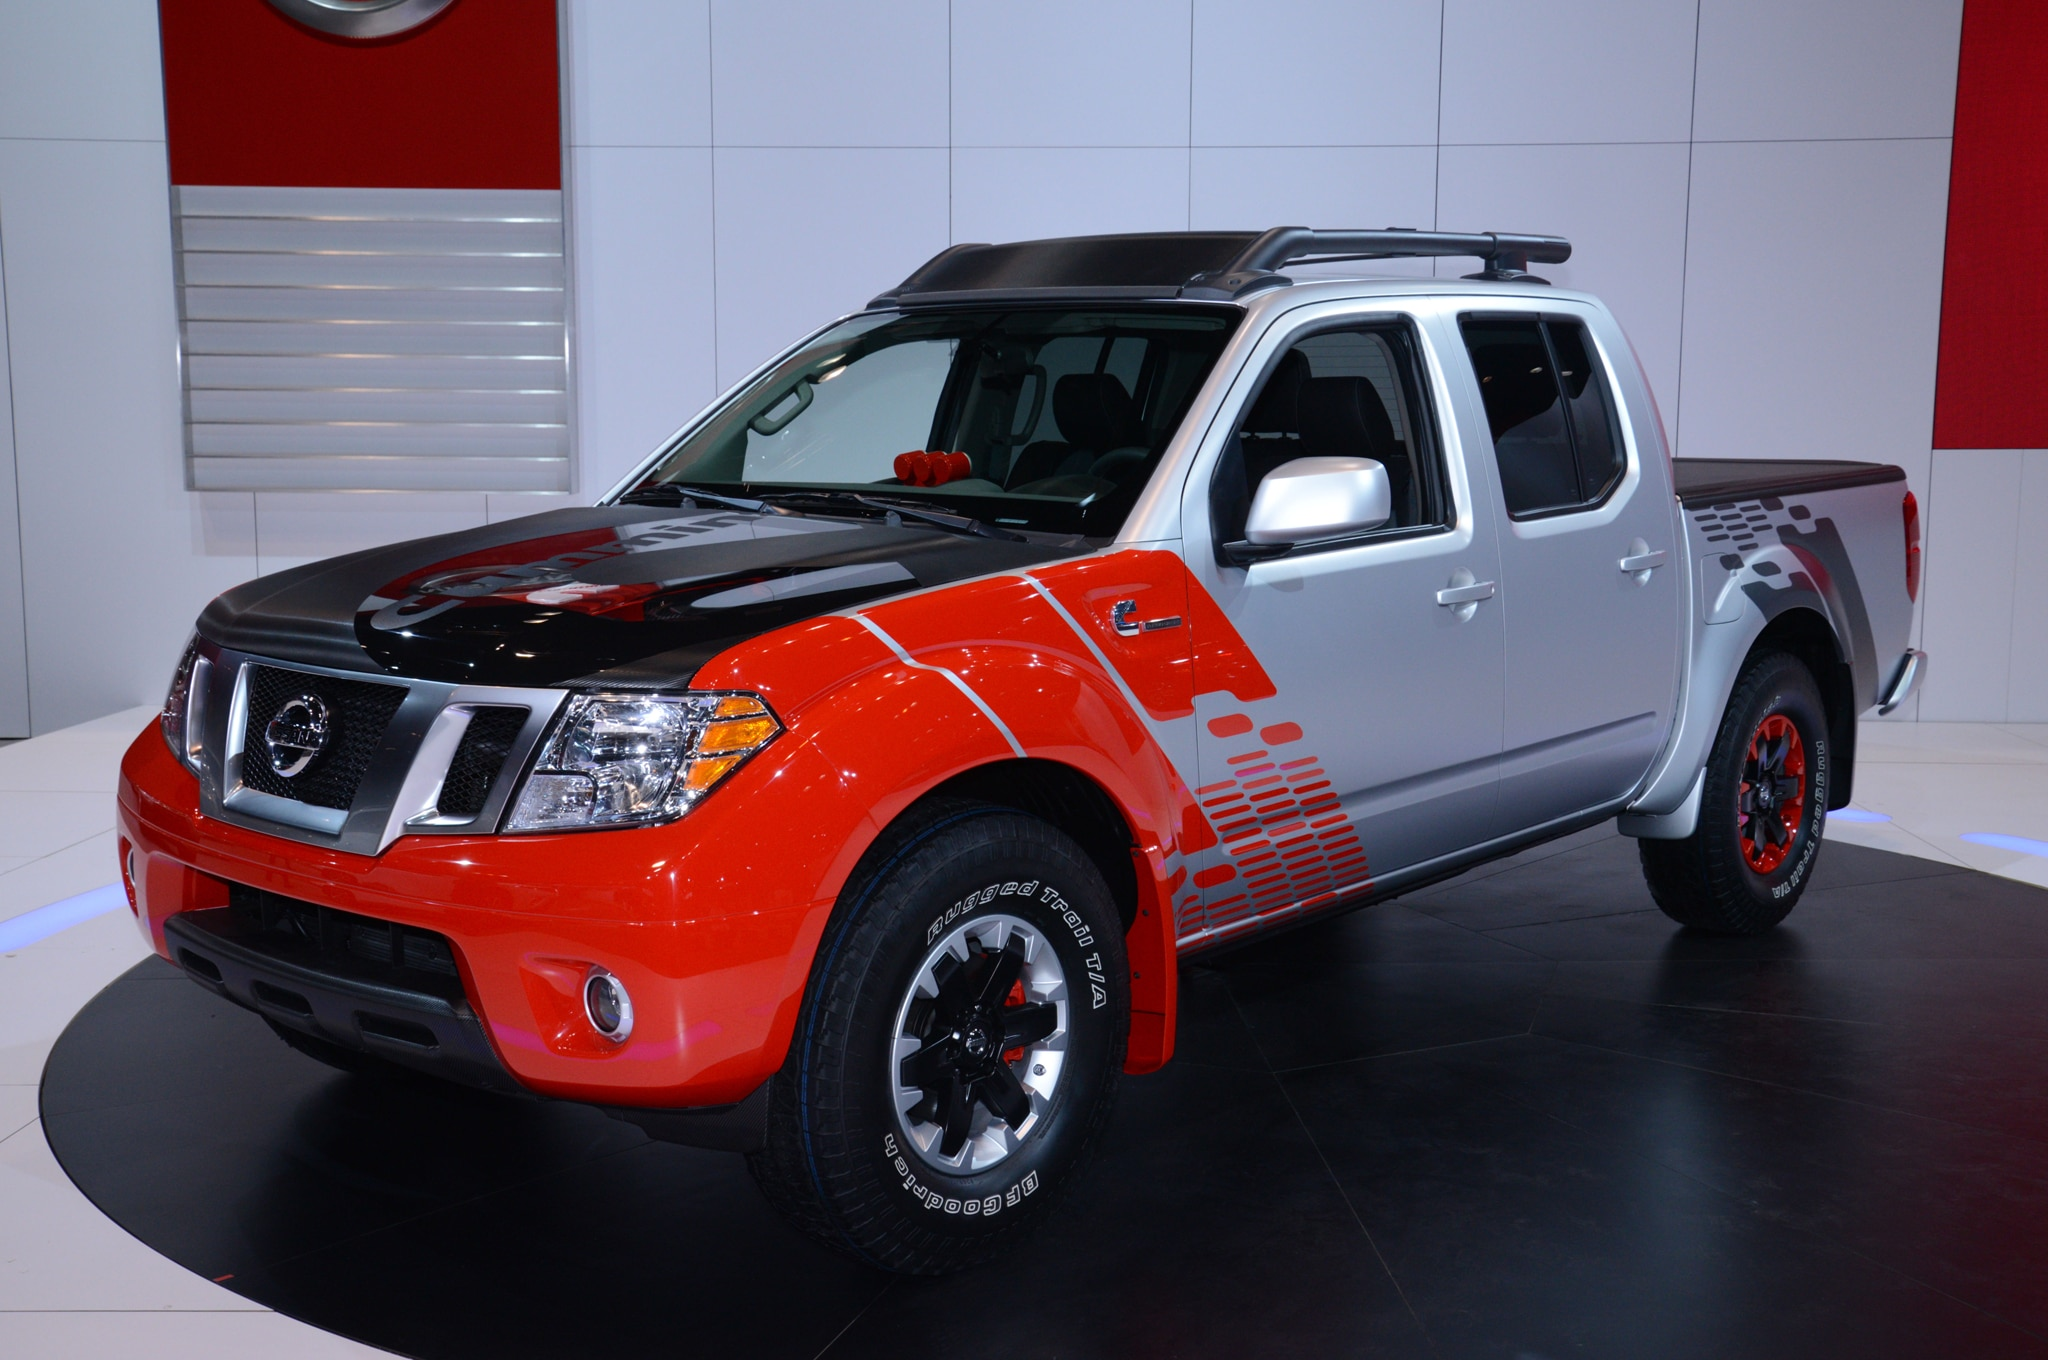 Nissan Frontier Diesel Runner Powered By Cummins Front View